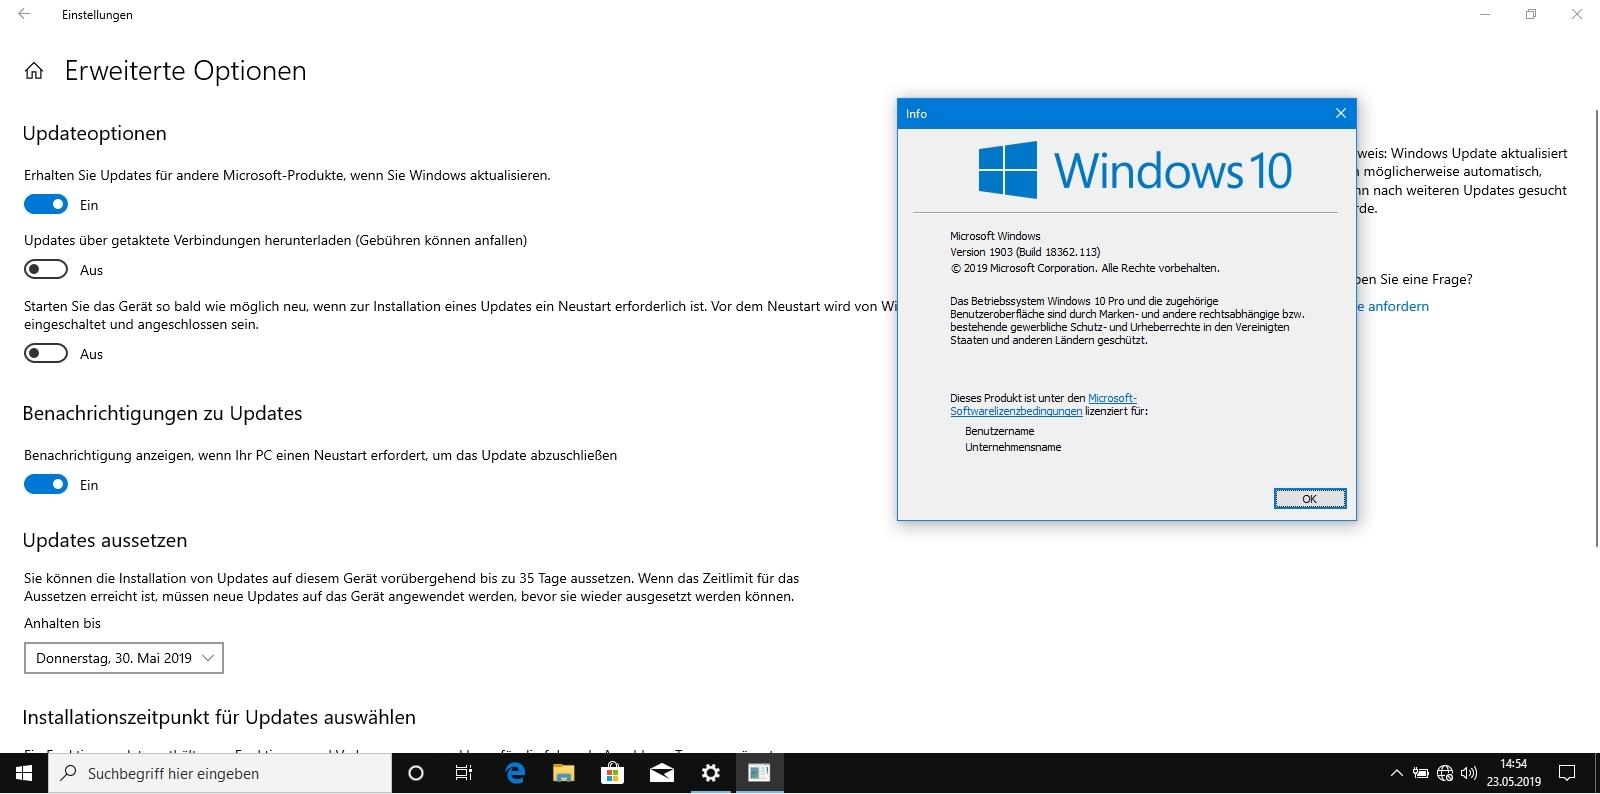 Windows-10-1903-18362-113-Windows-Update-1 — imgbb com